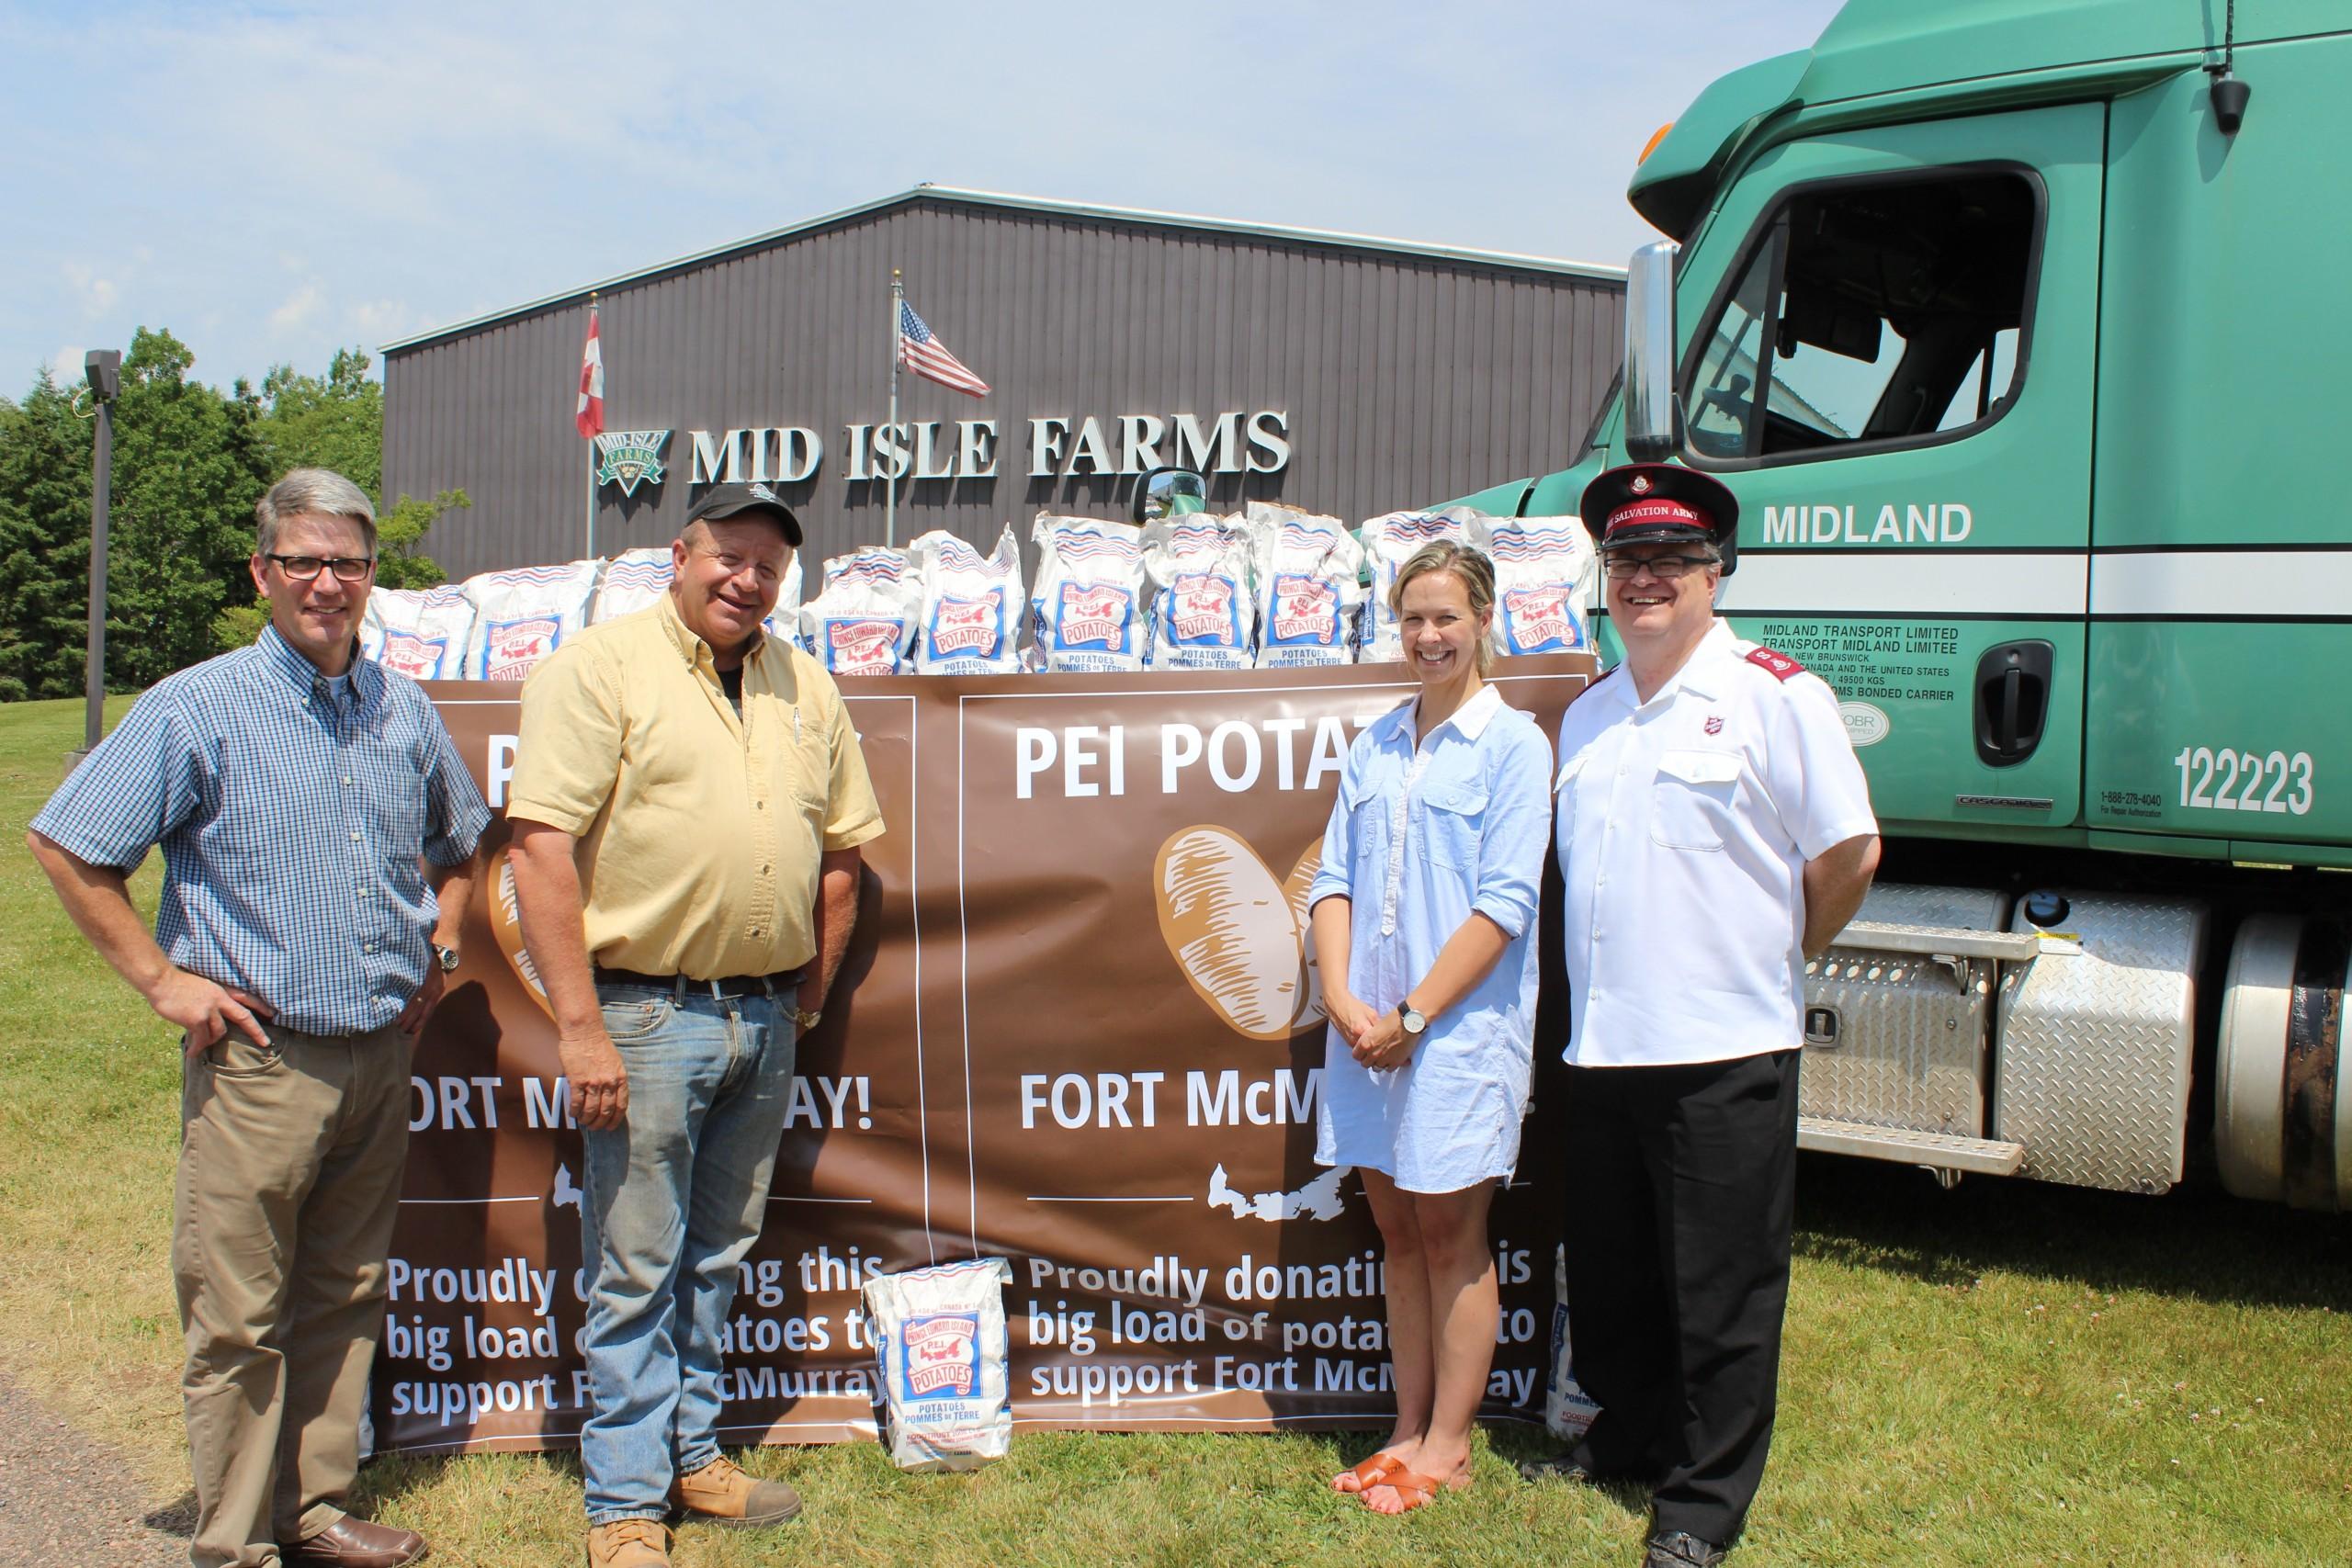 Spuds away! PEI farmers sending $30K worth of potatoes to Fort McMurray